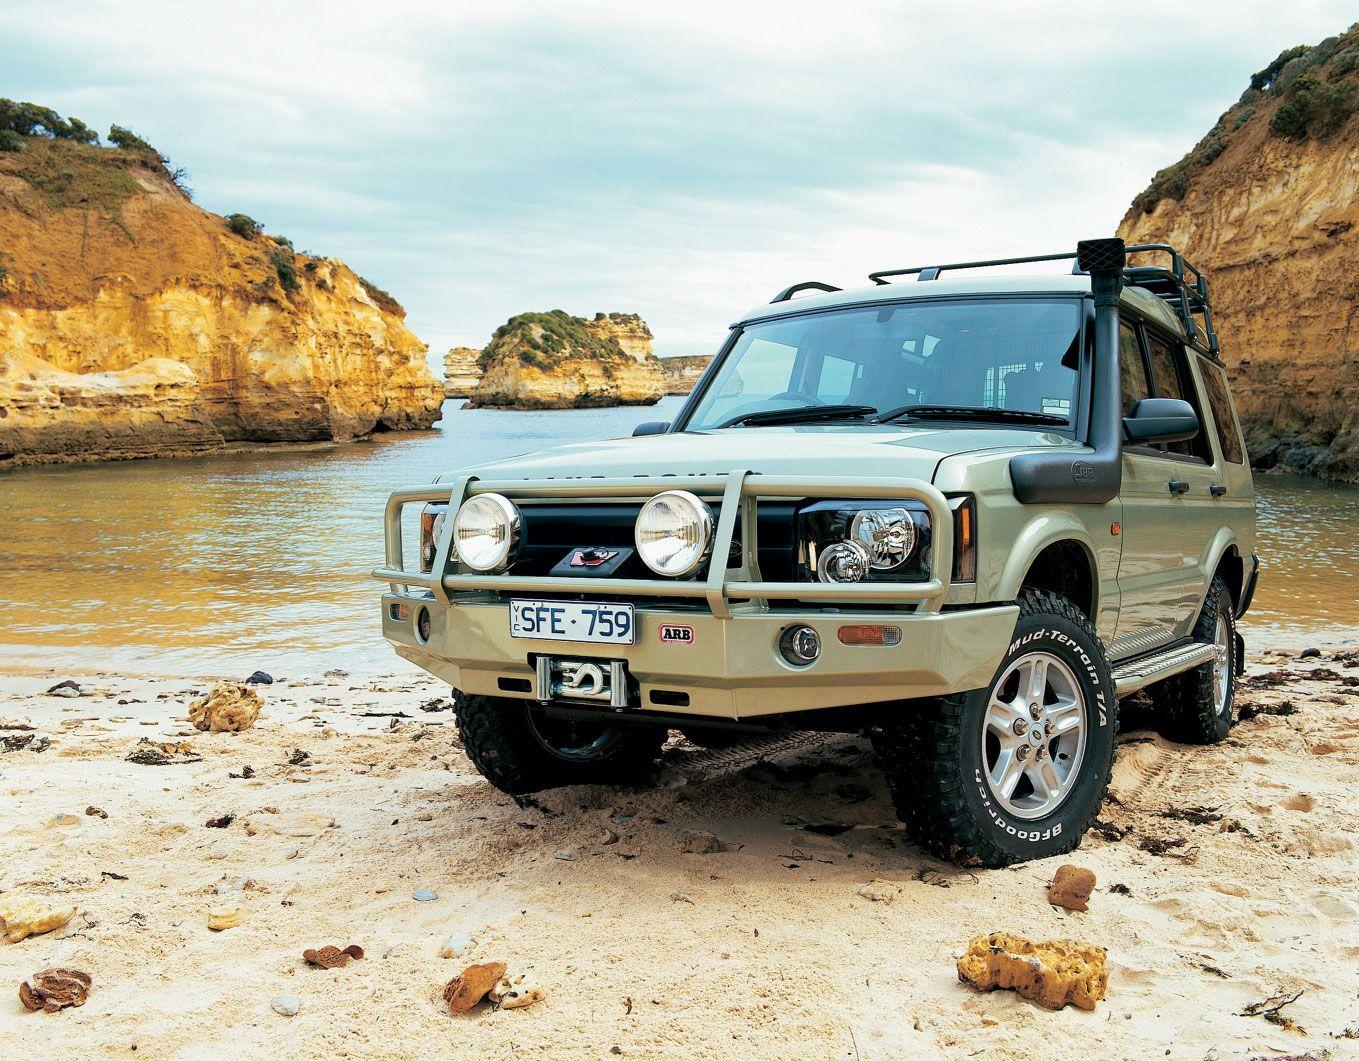 Land Rover Disco Arb Land Rover Land Rover Discovery 1 Land Rover Discovery